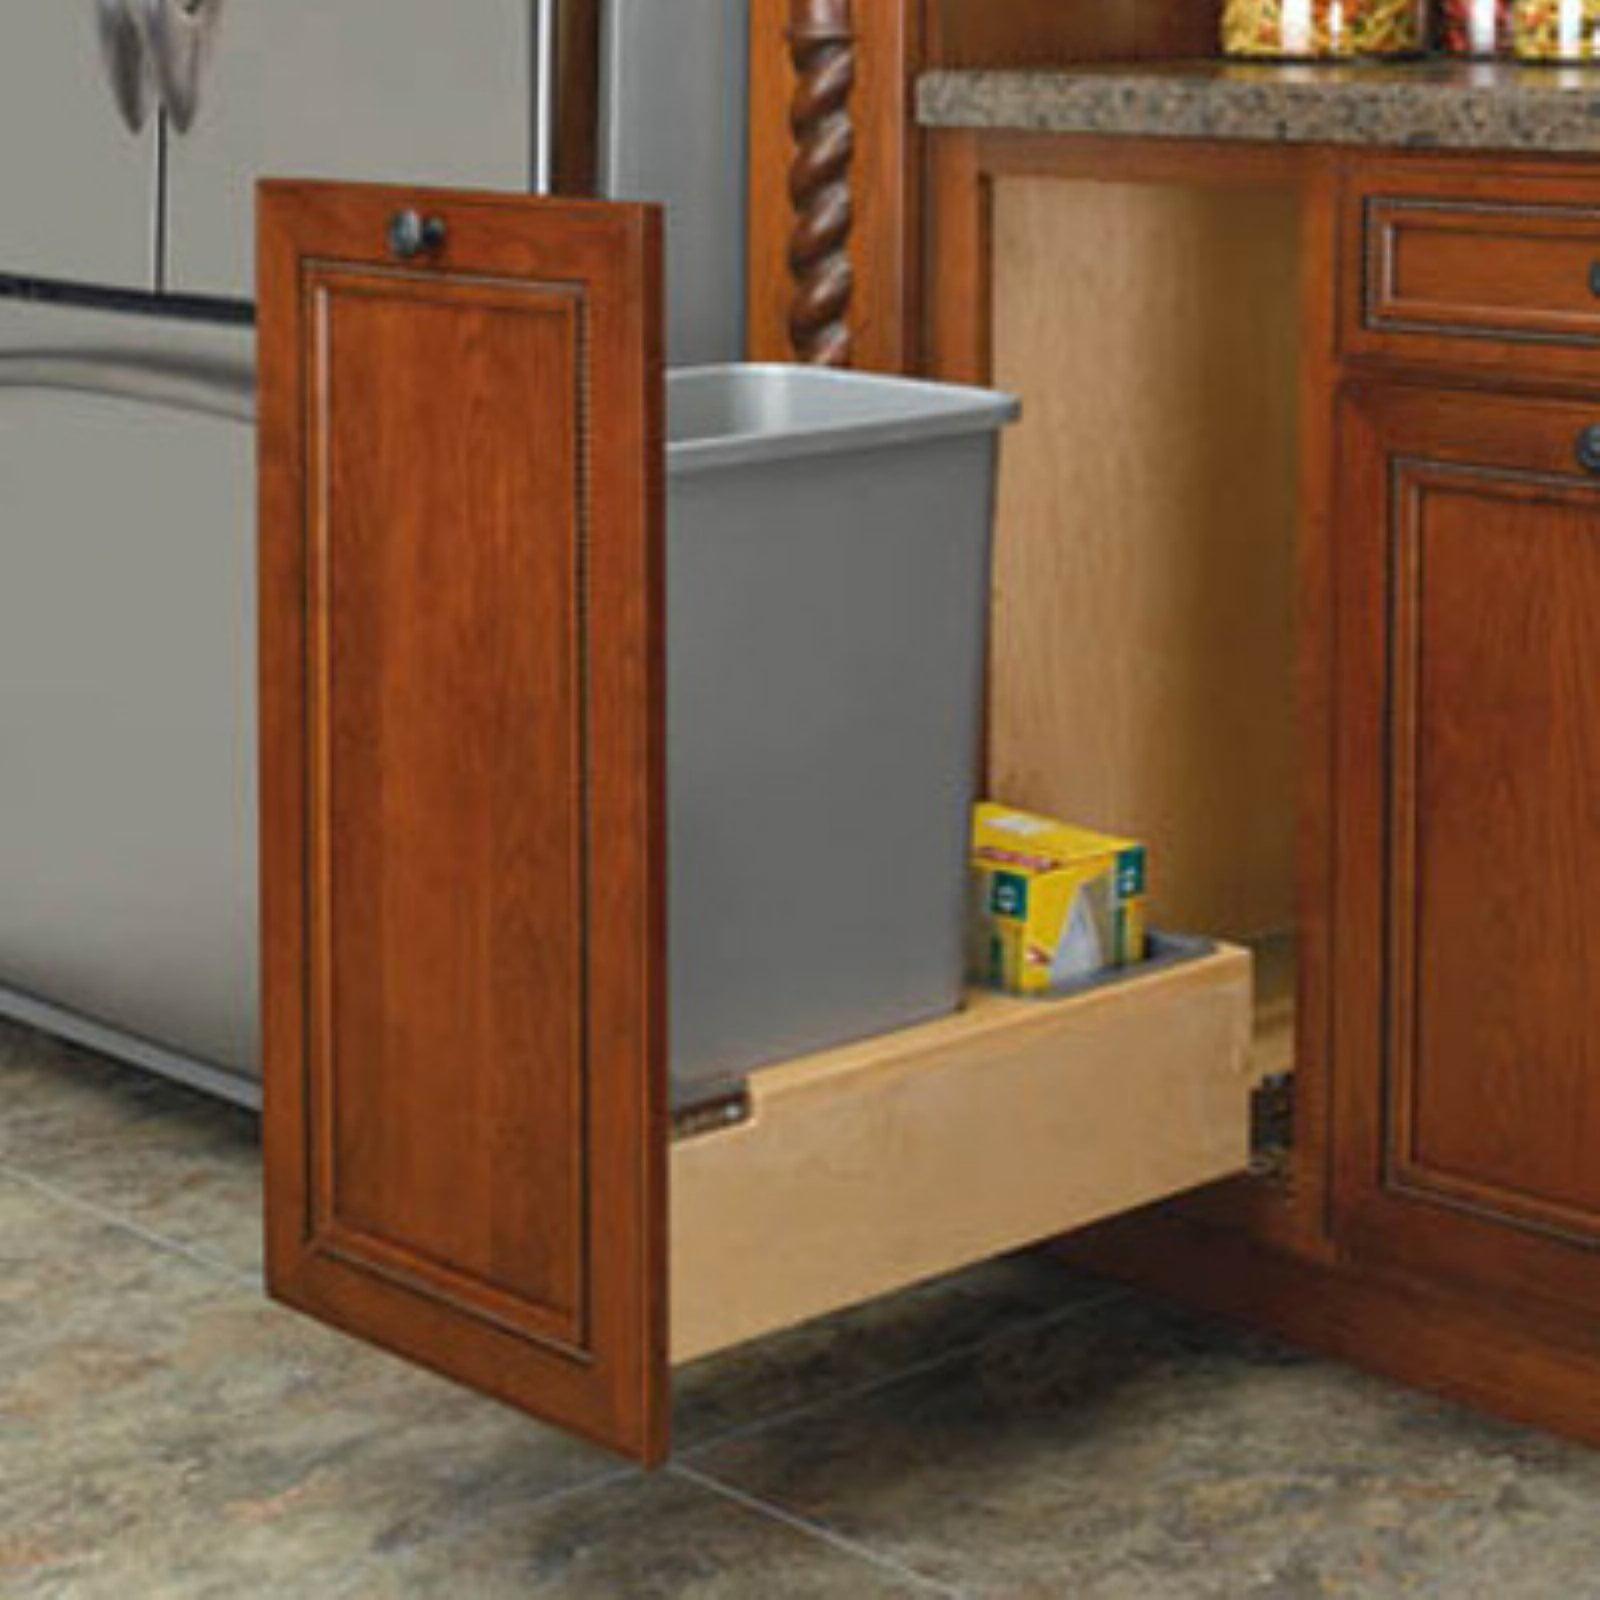 Rev-A-Shelf Single Rev-A-Motion Pull Out 50 qt. Trash Can